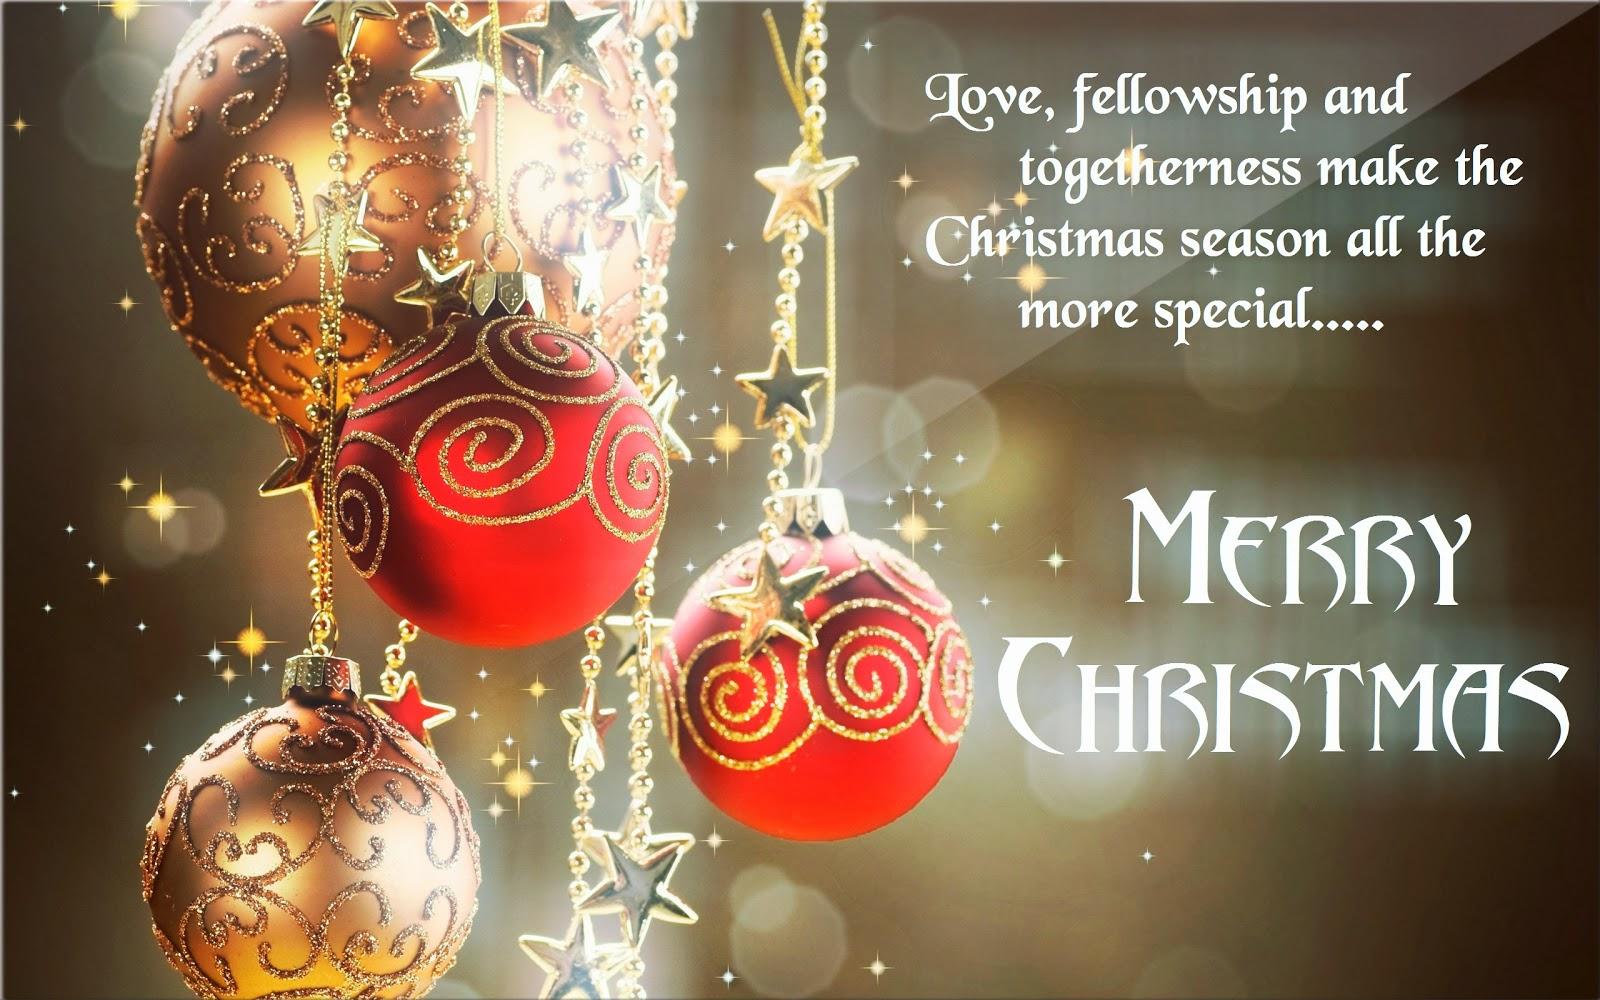 High Quality Merry Christmas Shayari Shayari Wishes SMS Status In Hindi U0026 English | 25th  दिसम्बर मैरी क्रिसमस शायरी स्टेटस विशेस SMS ...